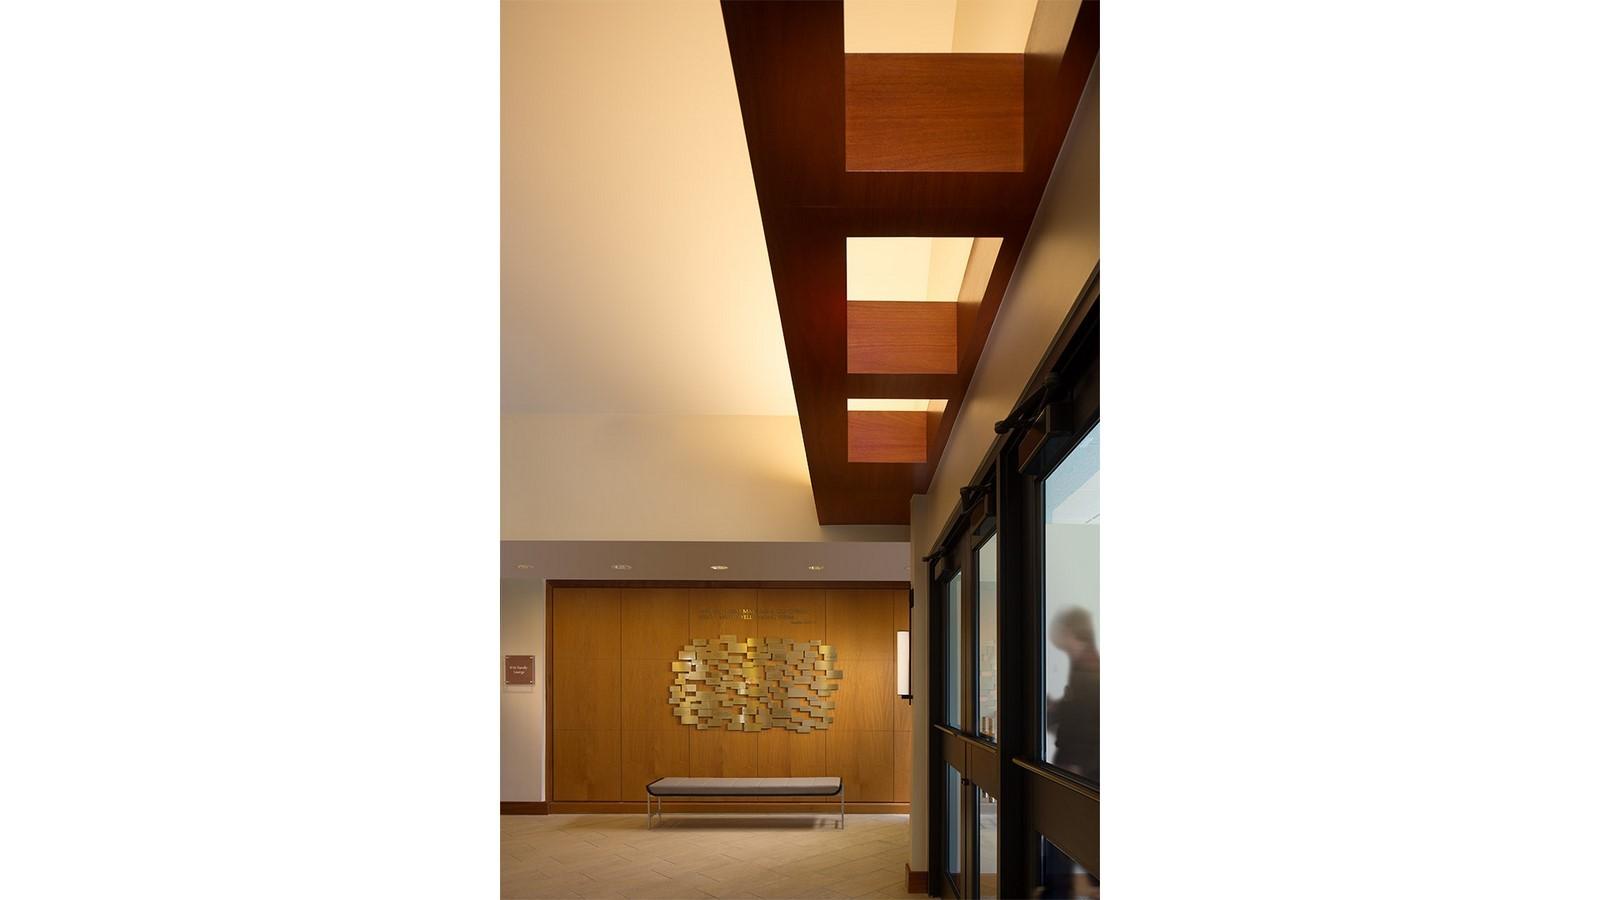 Cong.Etz Chaim Interior Renovations - Sheet4